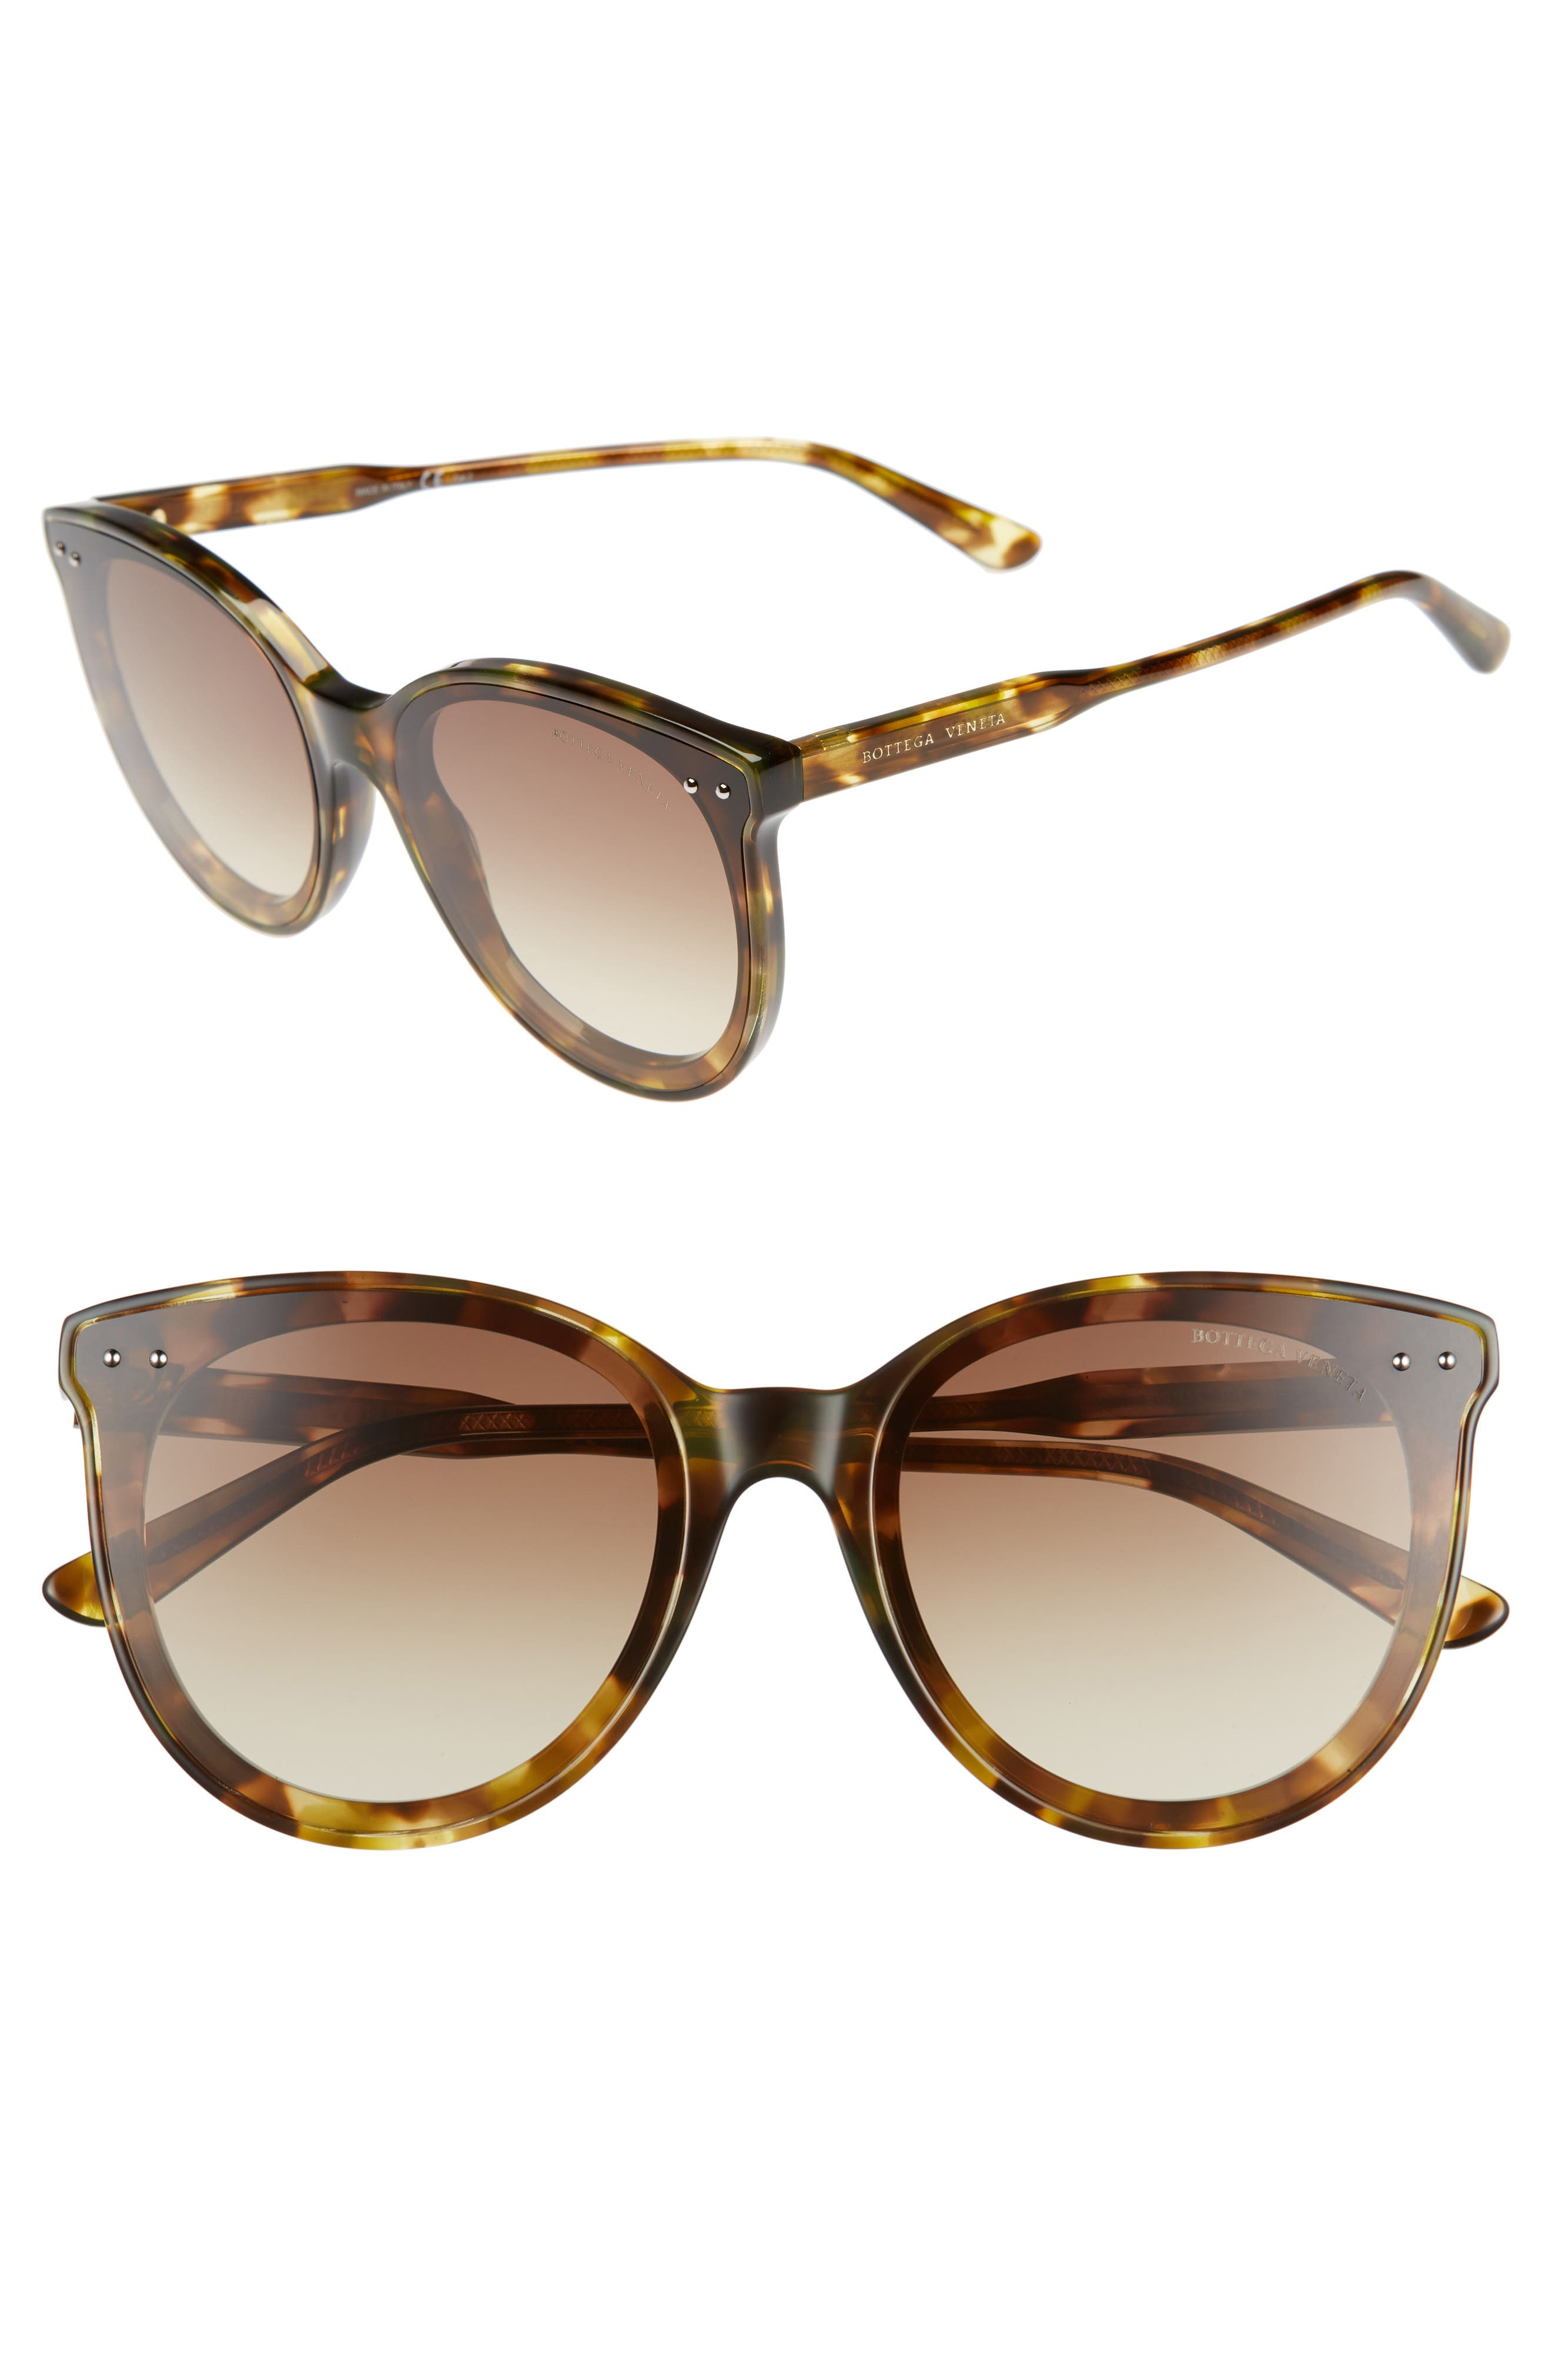 Bottega Veneta 61mm Cat Eye Sunglasses